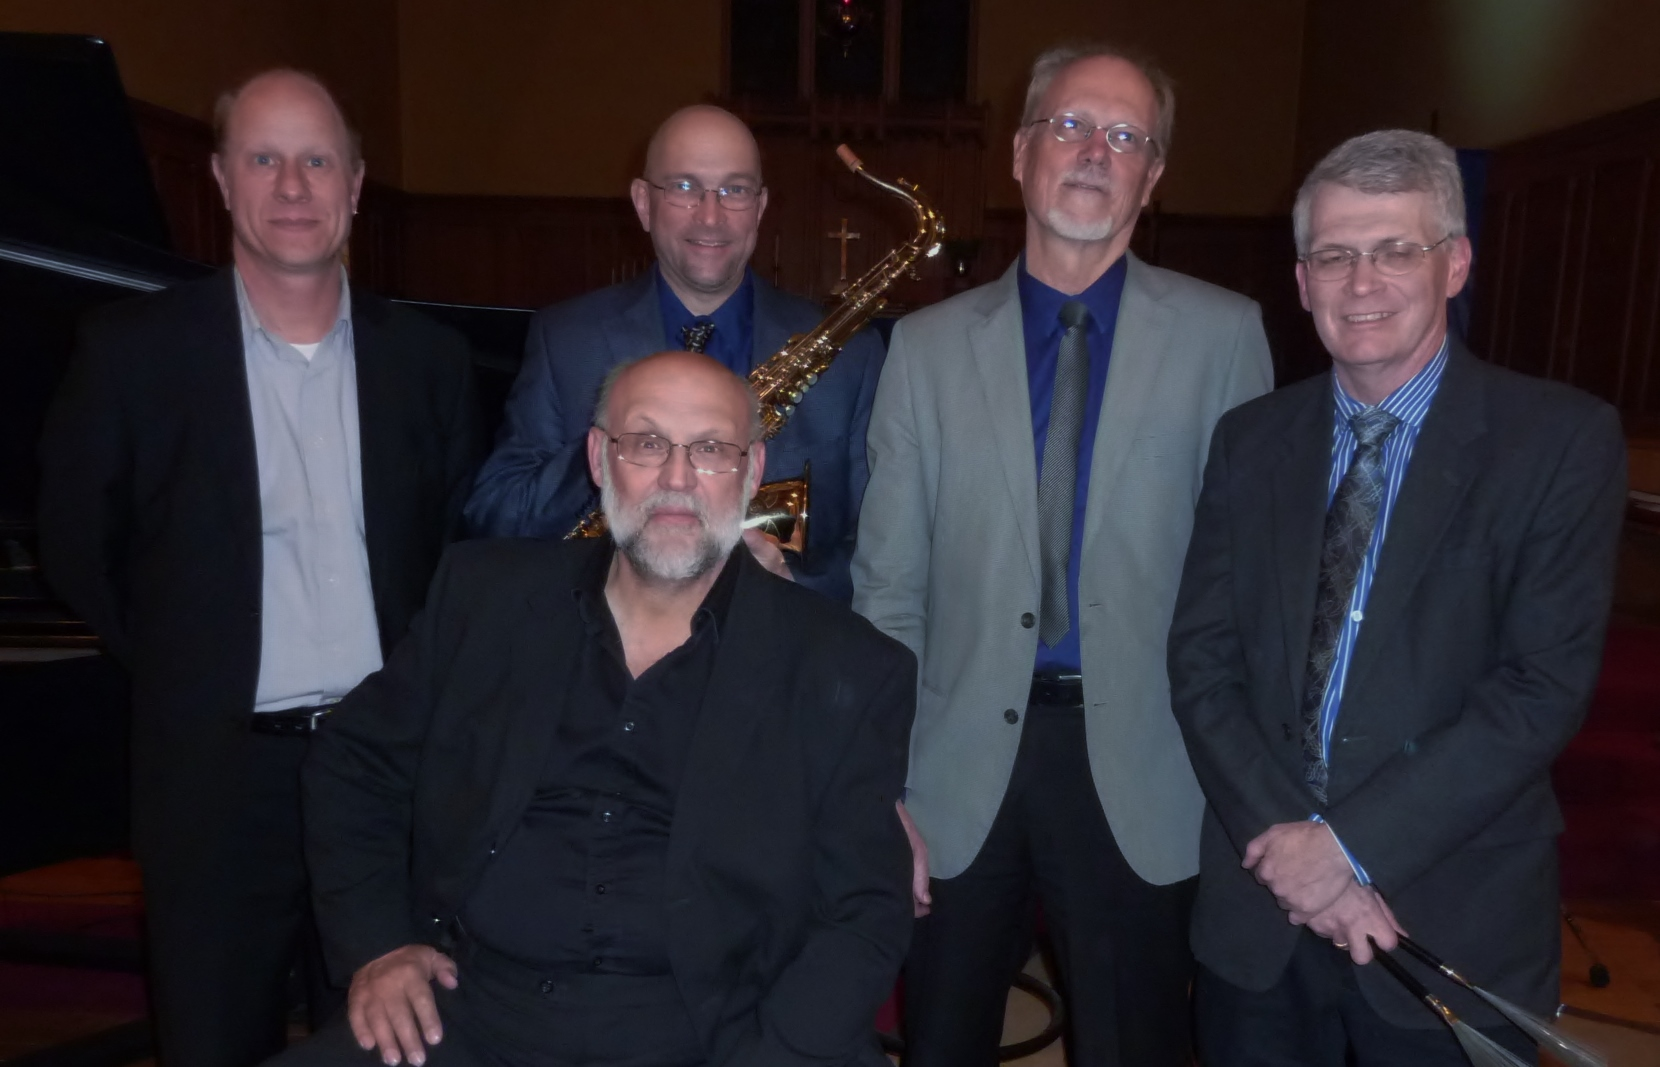 L -R: Gregory Prior, Reid Spencer, Ernie Kalwa, Bradley Moggach, Herb McNeil